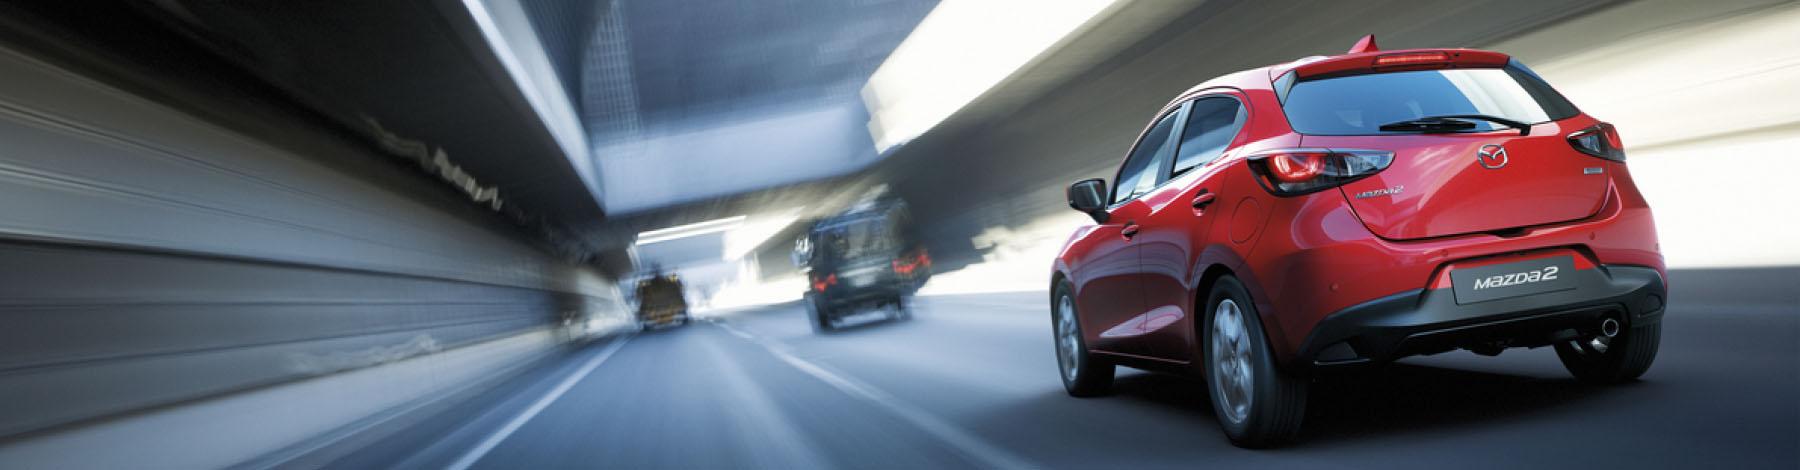 Mazda service coupons houston